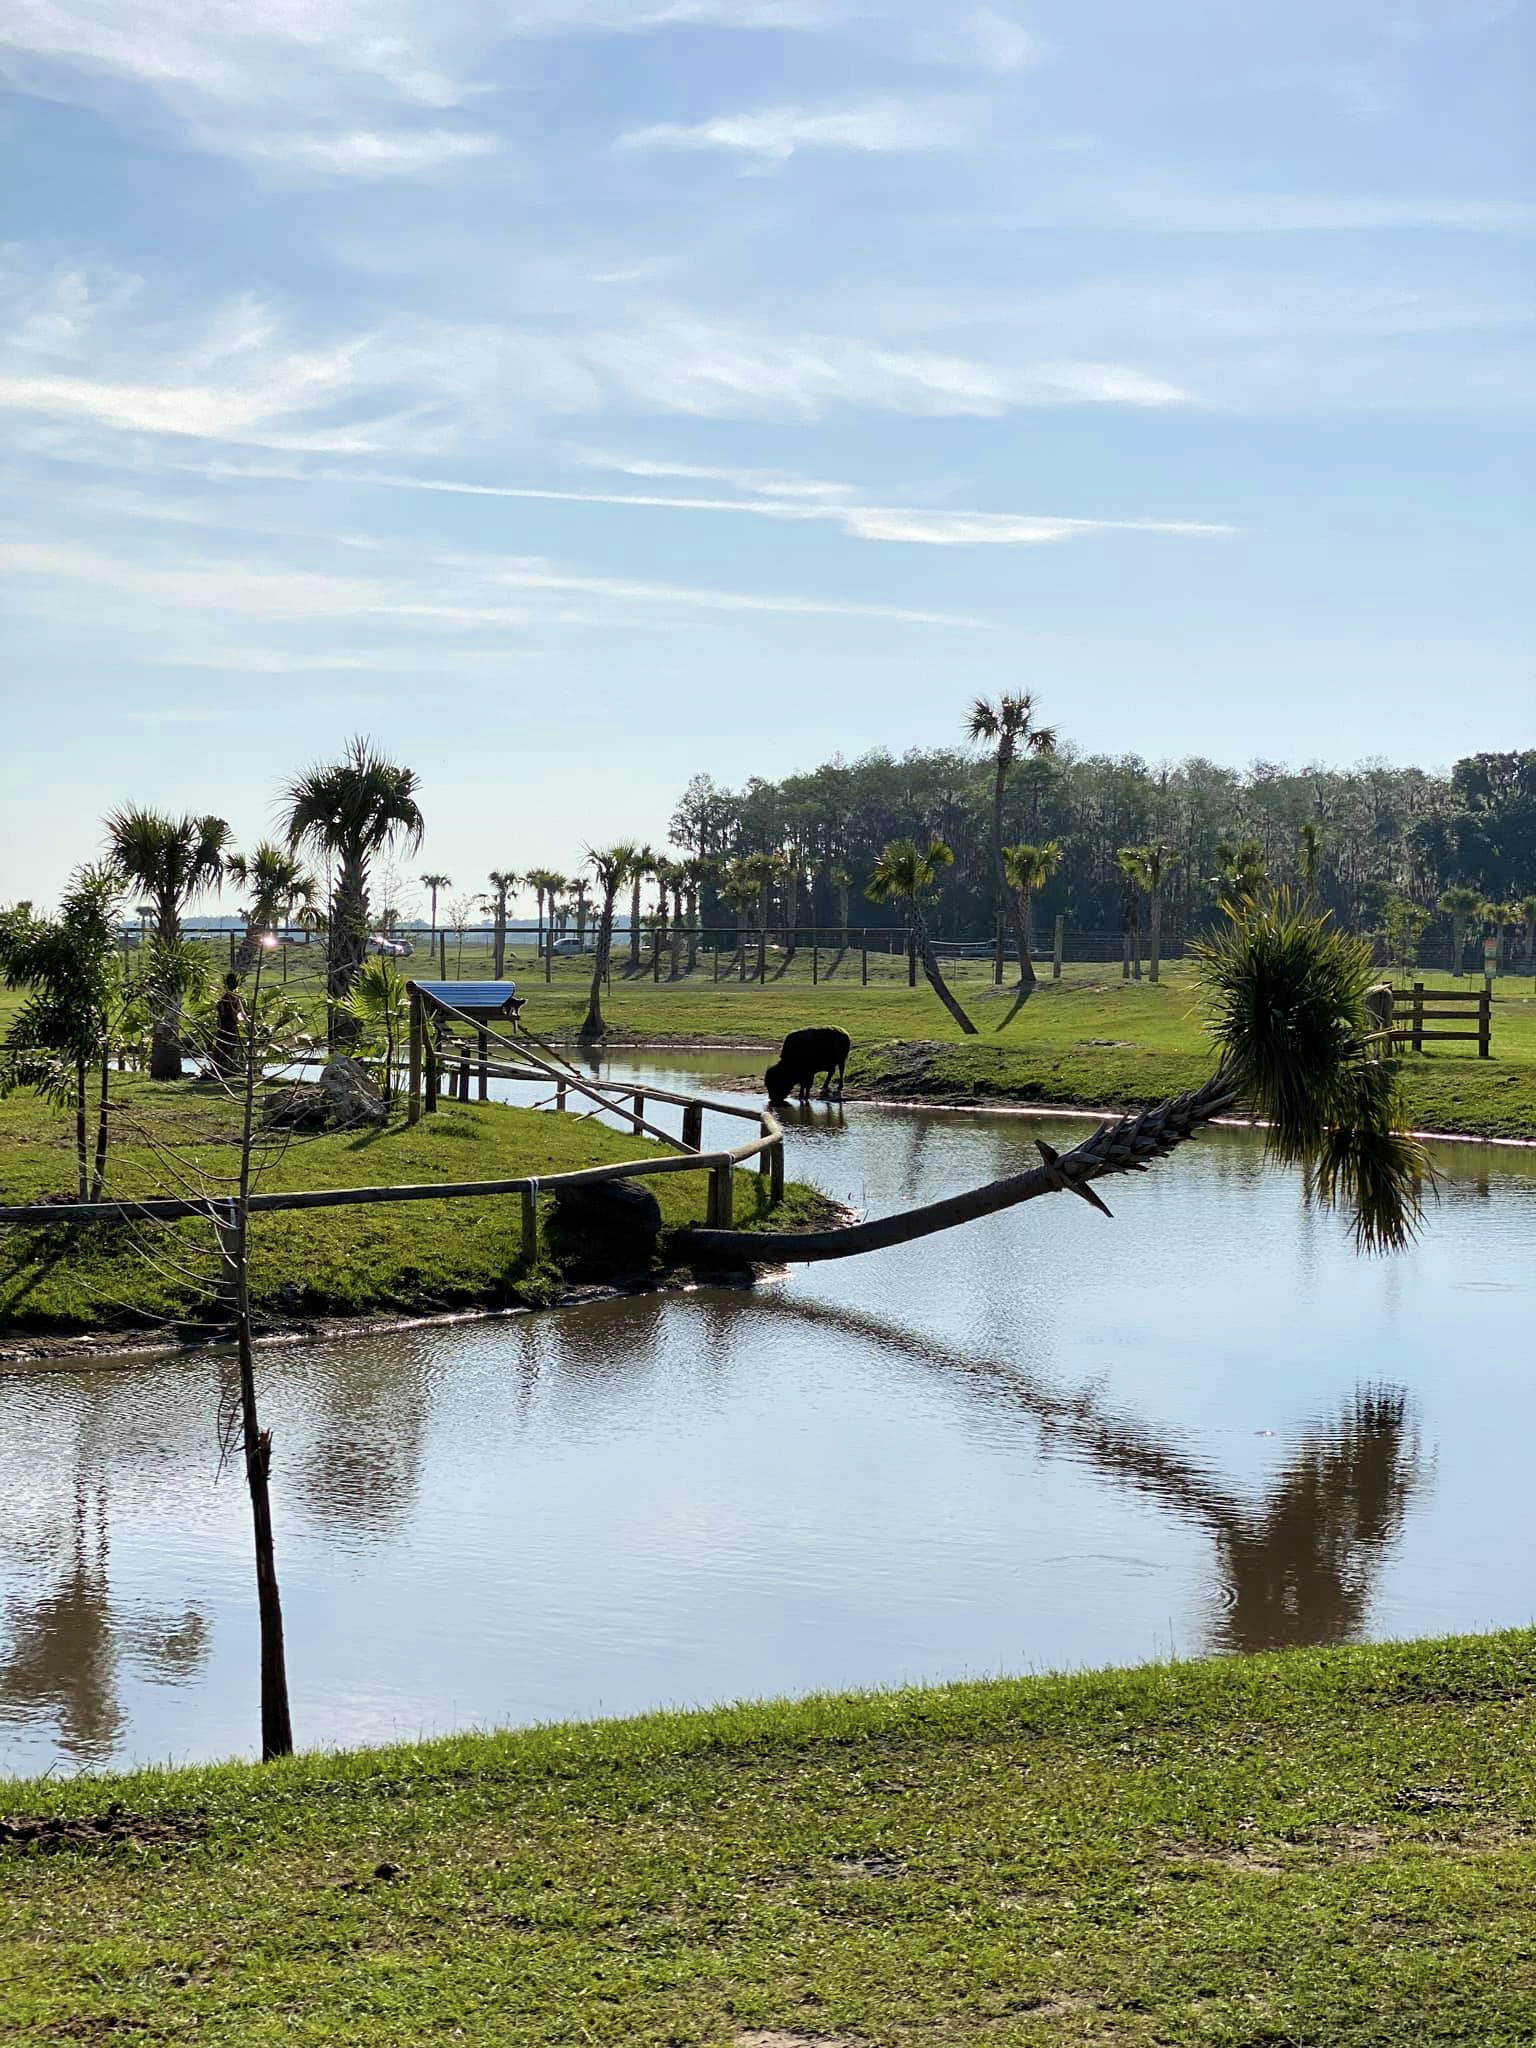 Landscape of Wild Florida Drive-Thru Safari Park